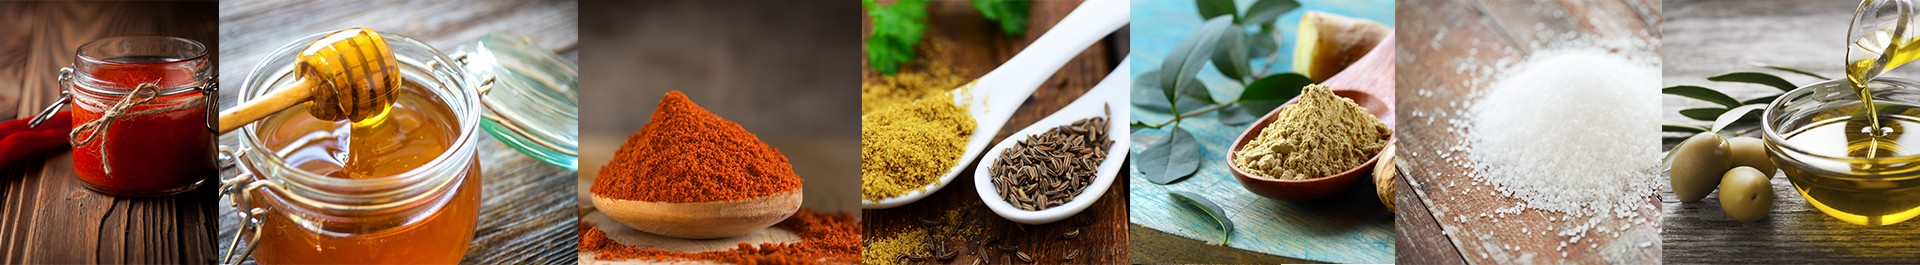 sriracha seed ingredients